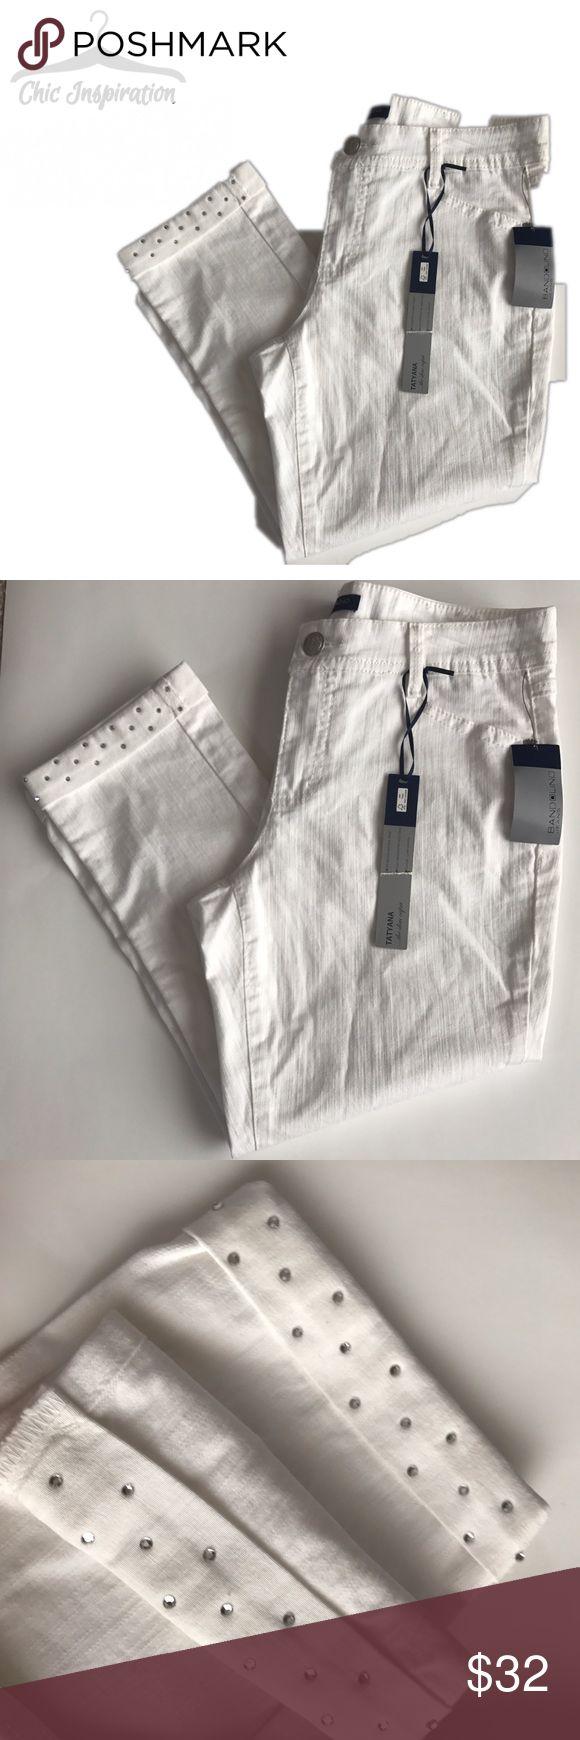 Bandolino White Denim Capris Pants NWT Sits below natural waist, slim through hip and thigh, classic capri length. Stretch. Rhinestones at the hem. Bandolino Pants Capris